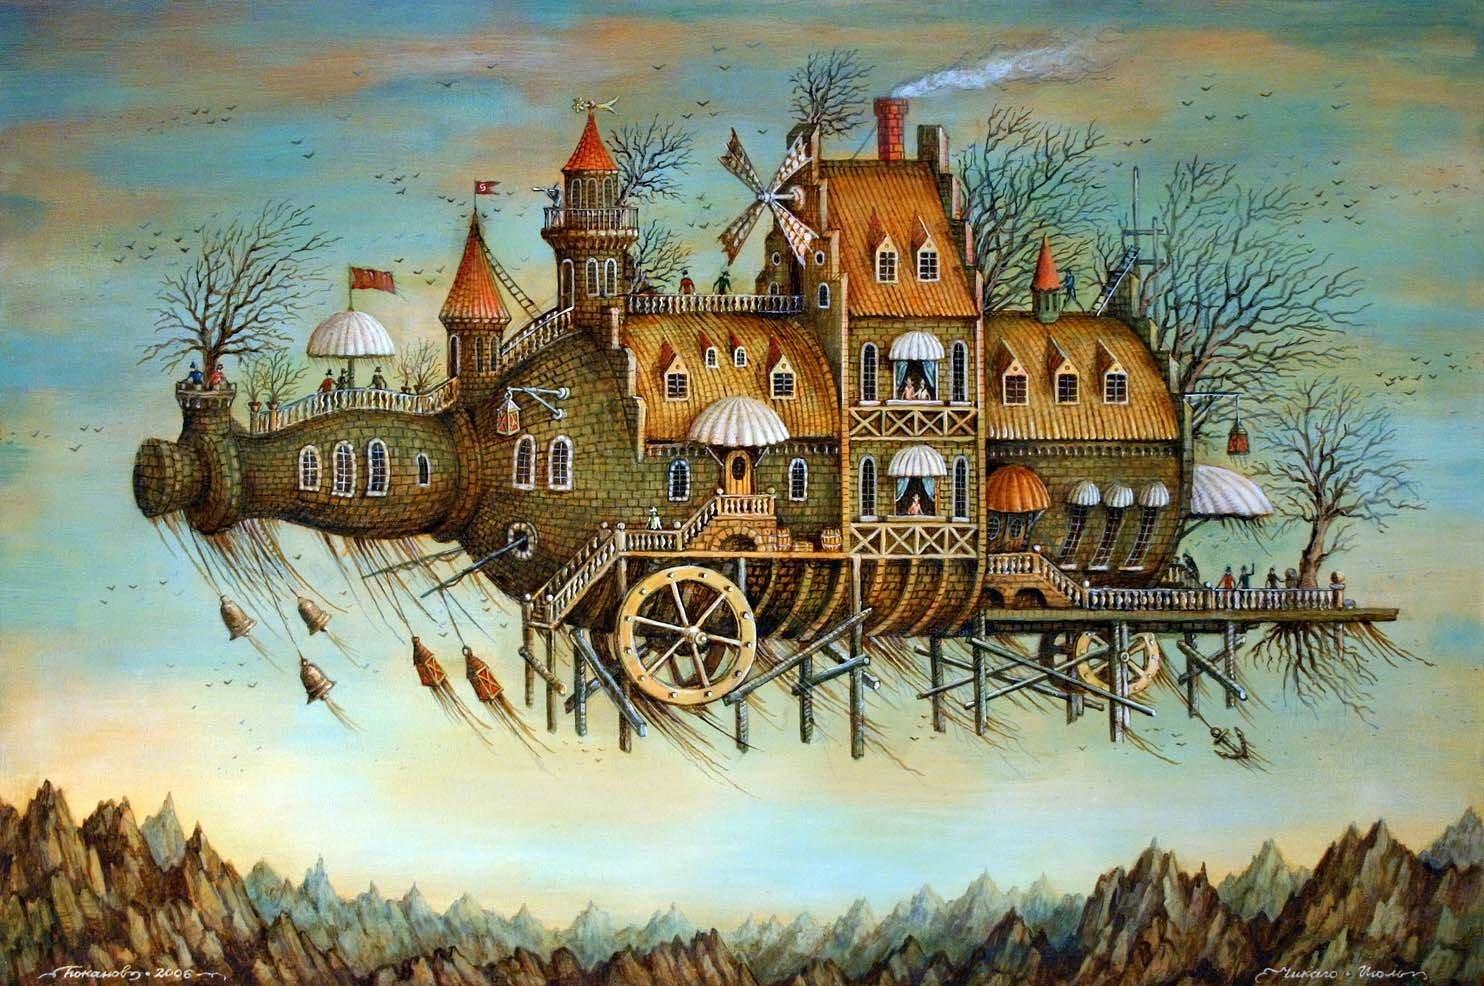 Artifact Puzzles Tyukanov Flying Bottle Wooden Jigsaw Puzzle